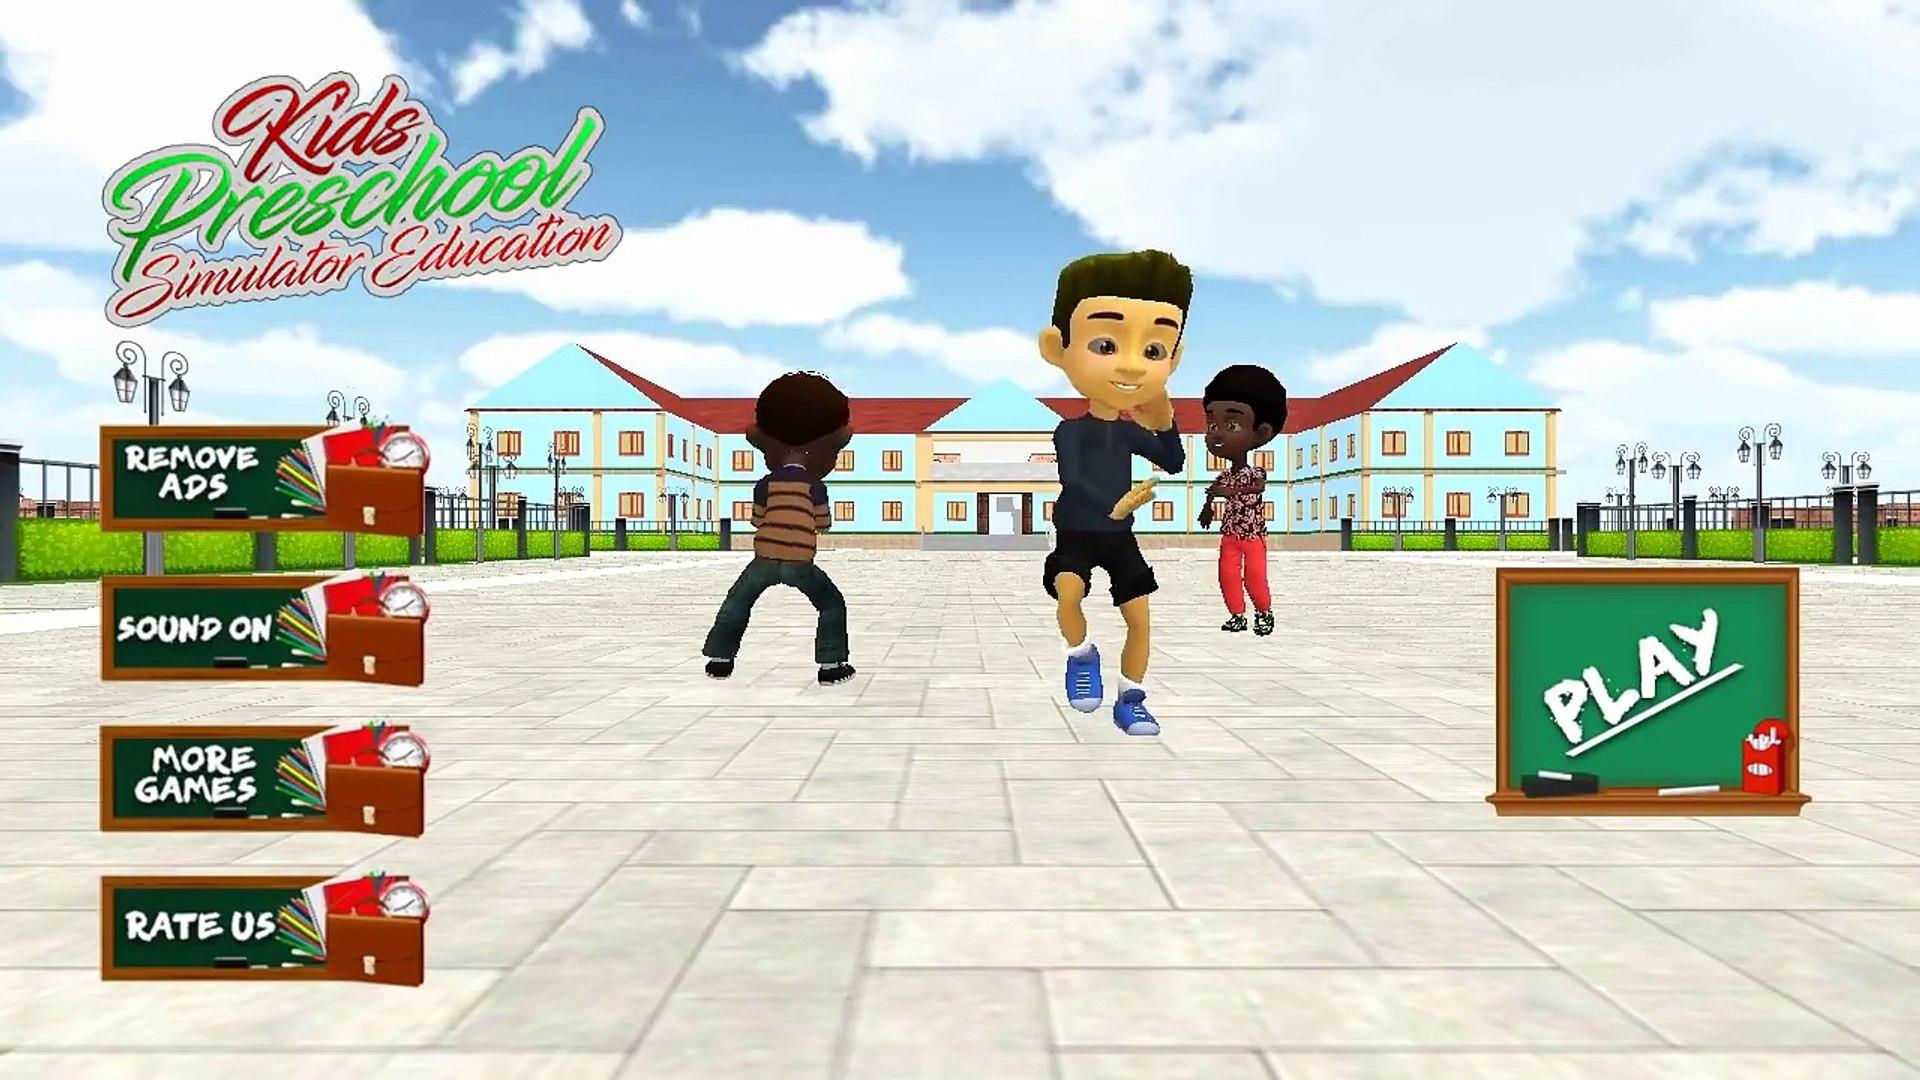 Preschool Kids Simulator Education Learning games